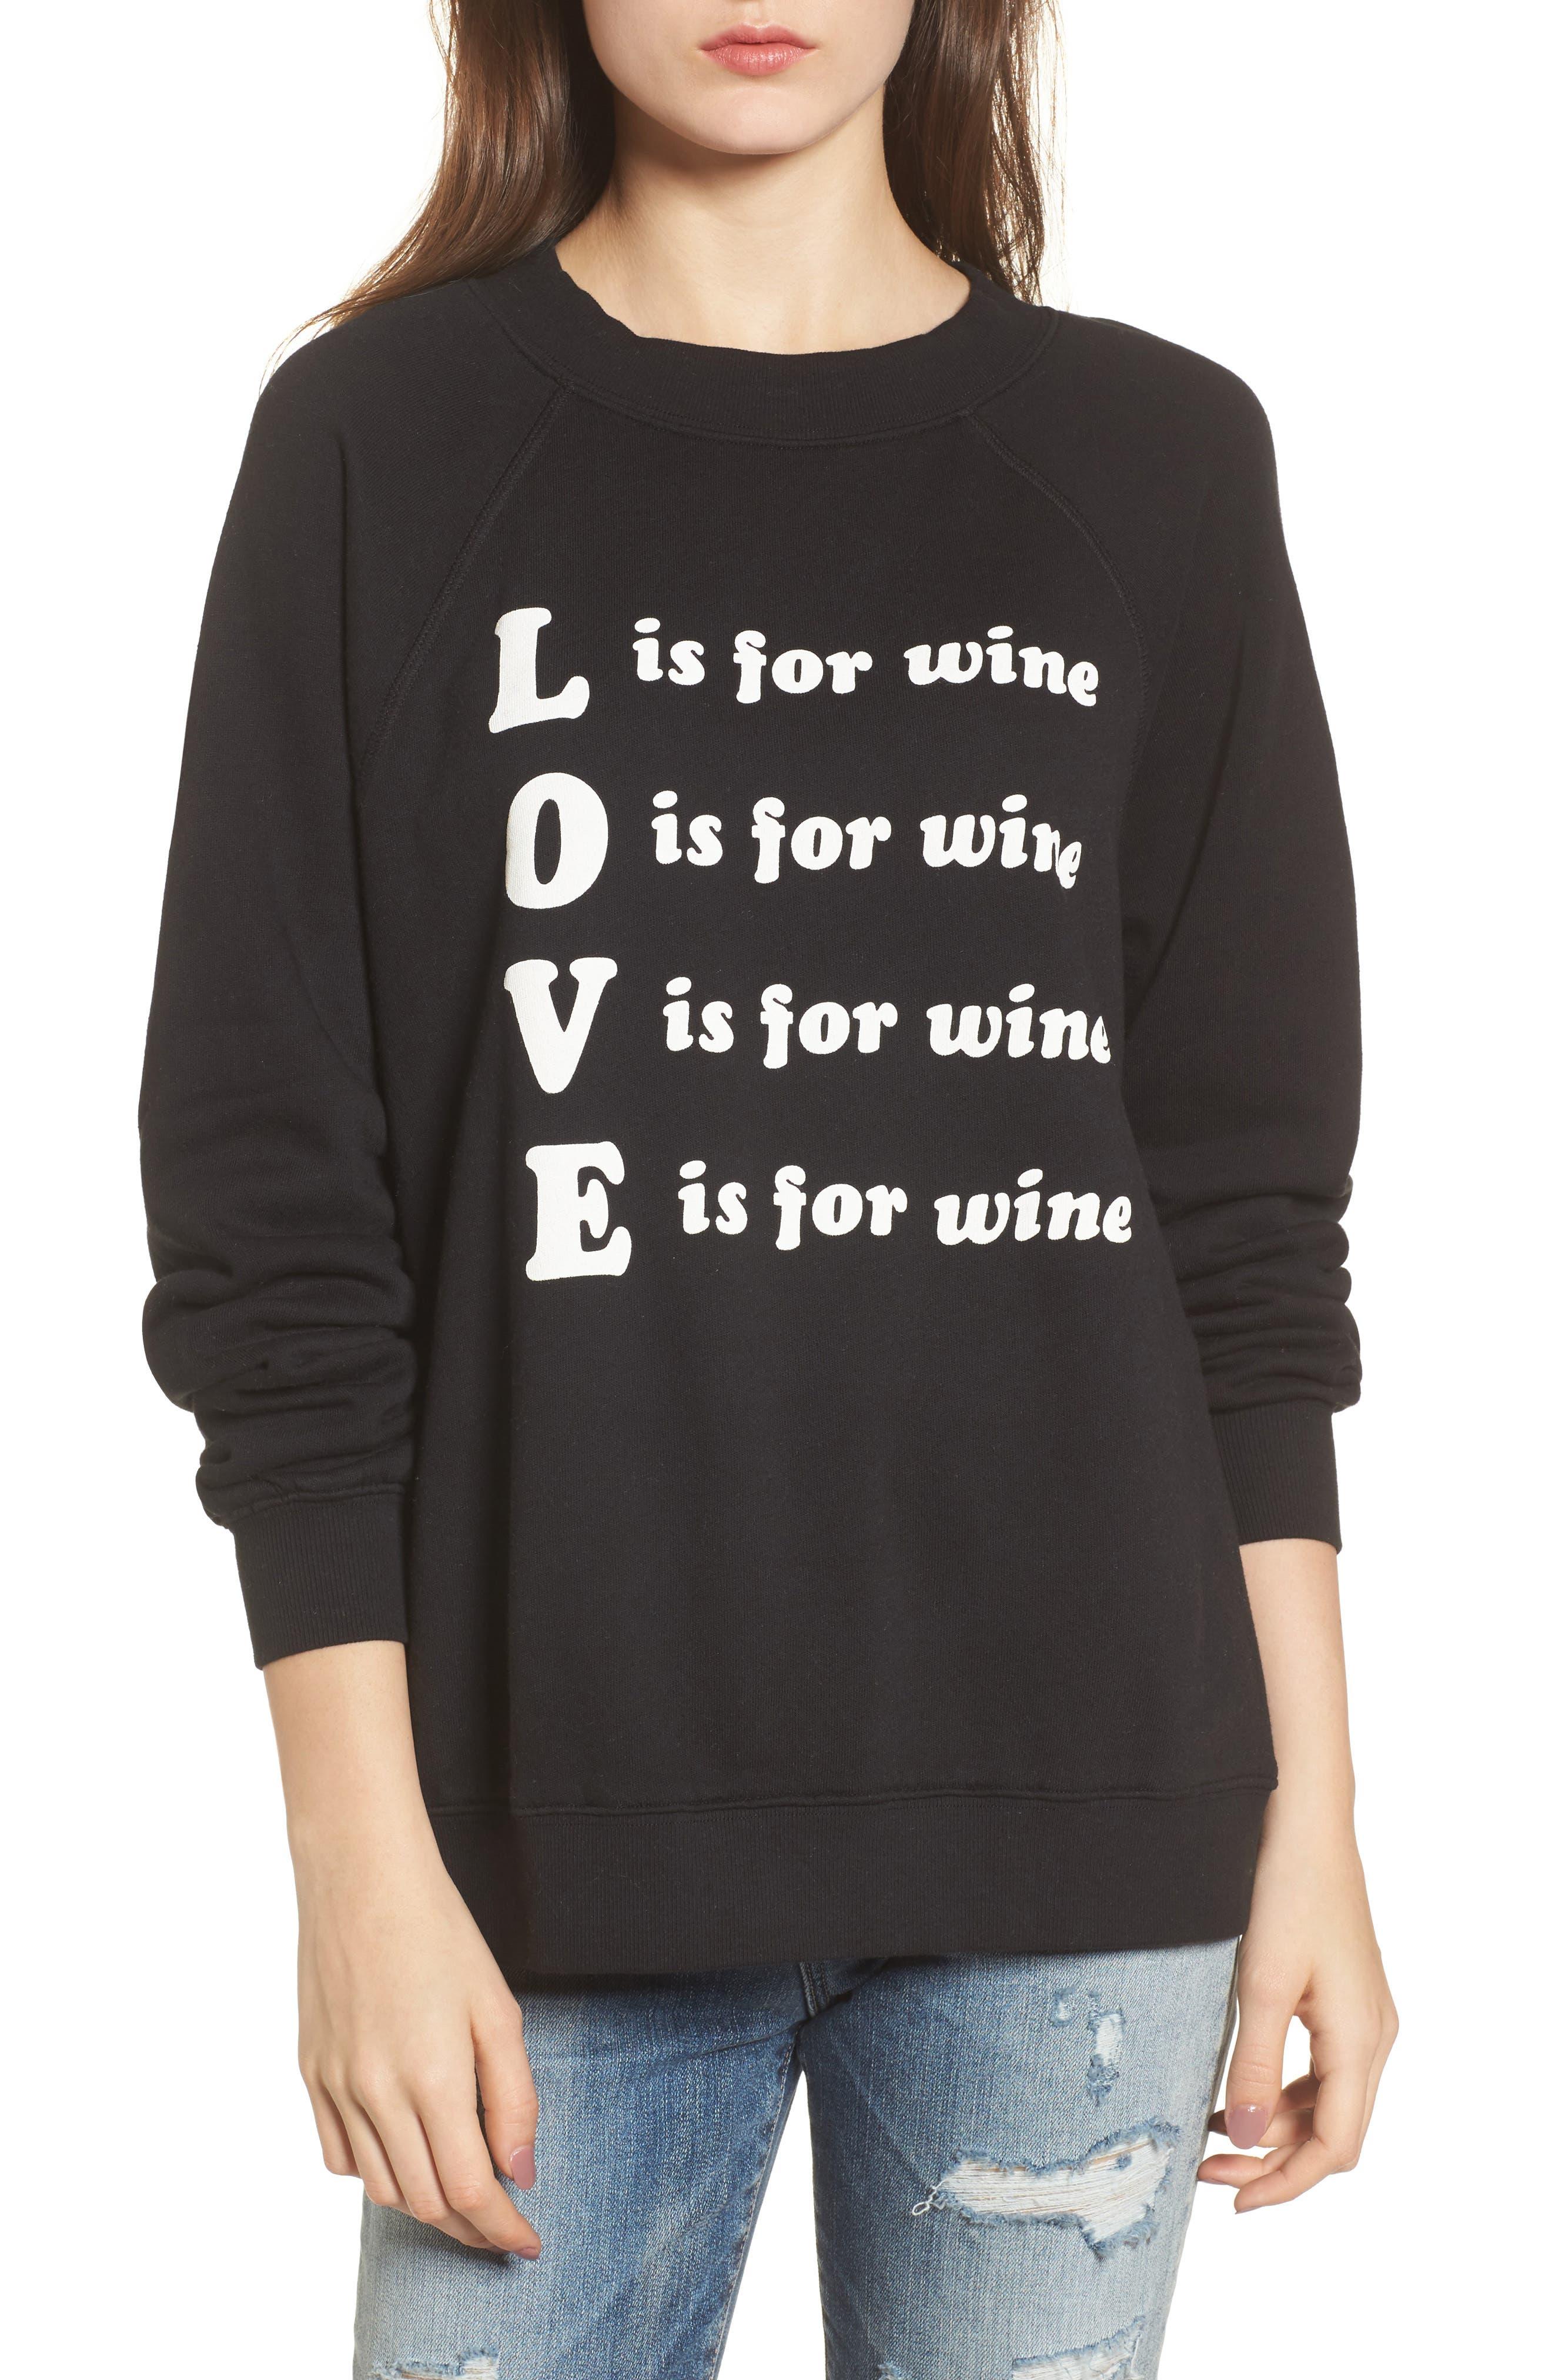 Wino - Sommers Sweatshirt,                             Main thumbnail 1, color,                             Black